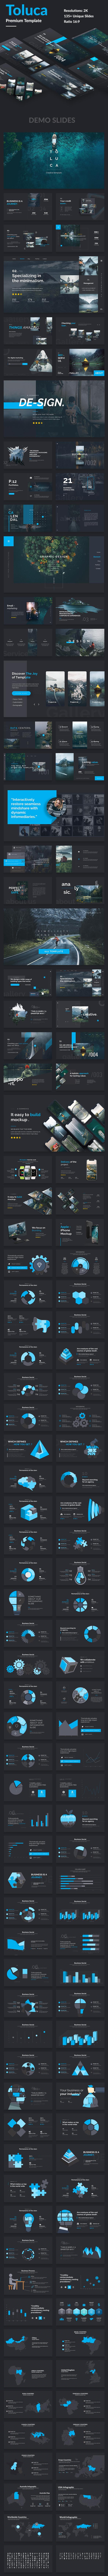 Toluca Premium Design Keynote Template - Creative Keynote Templates